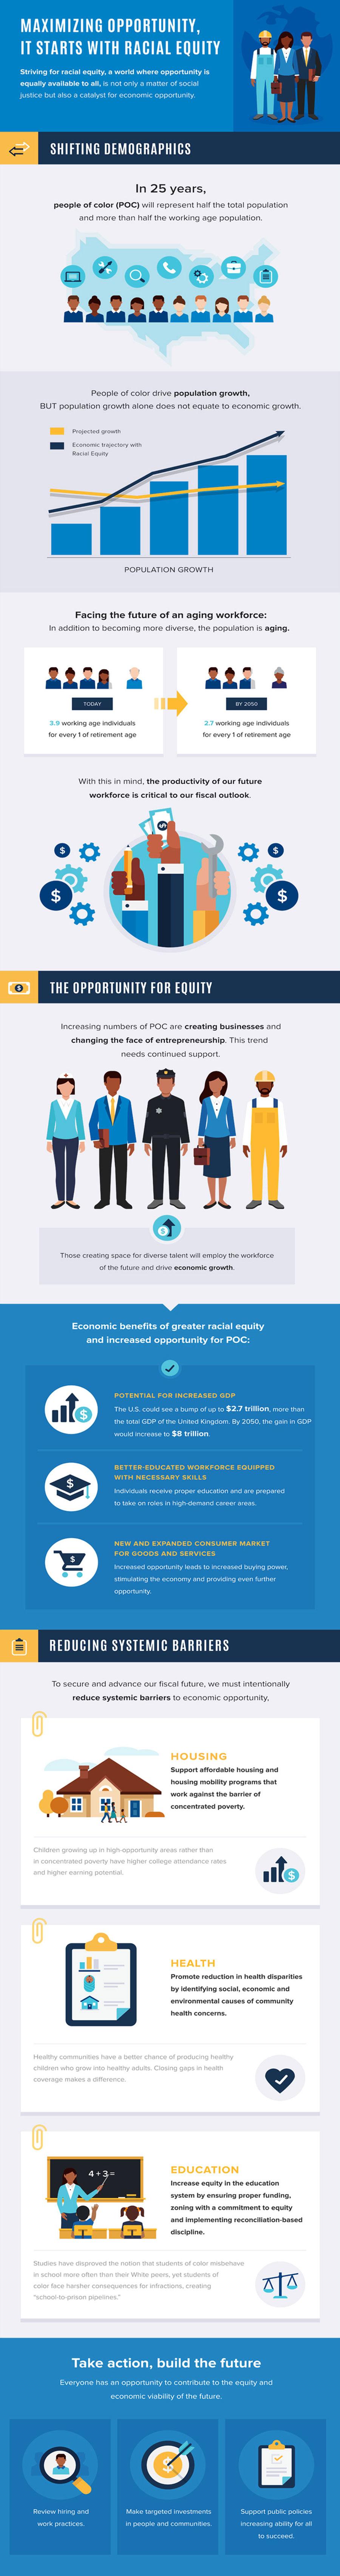 infographic_racialdemographic